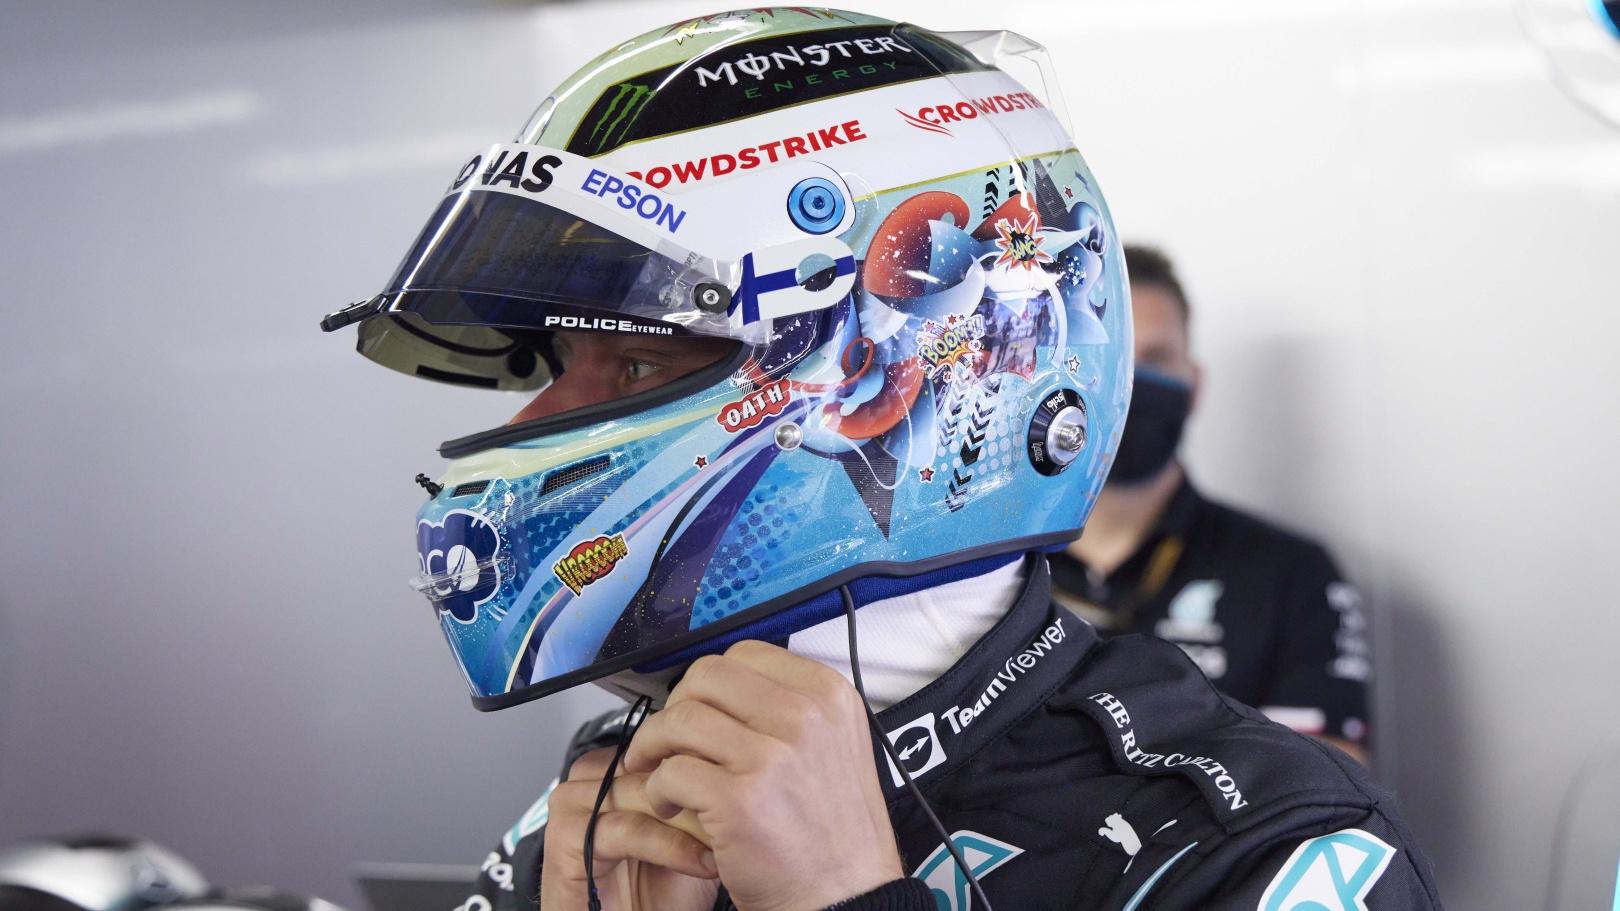 Azerbaijan Grand Prix live stream: how to watch F1 live from Baku for free